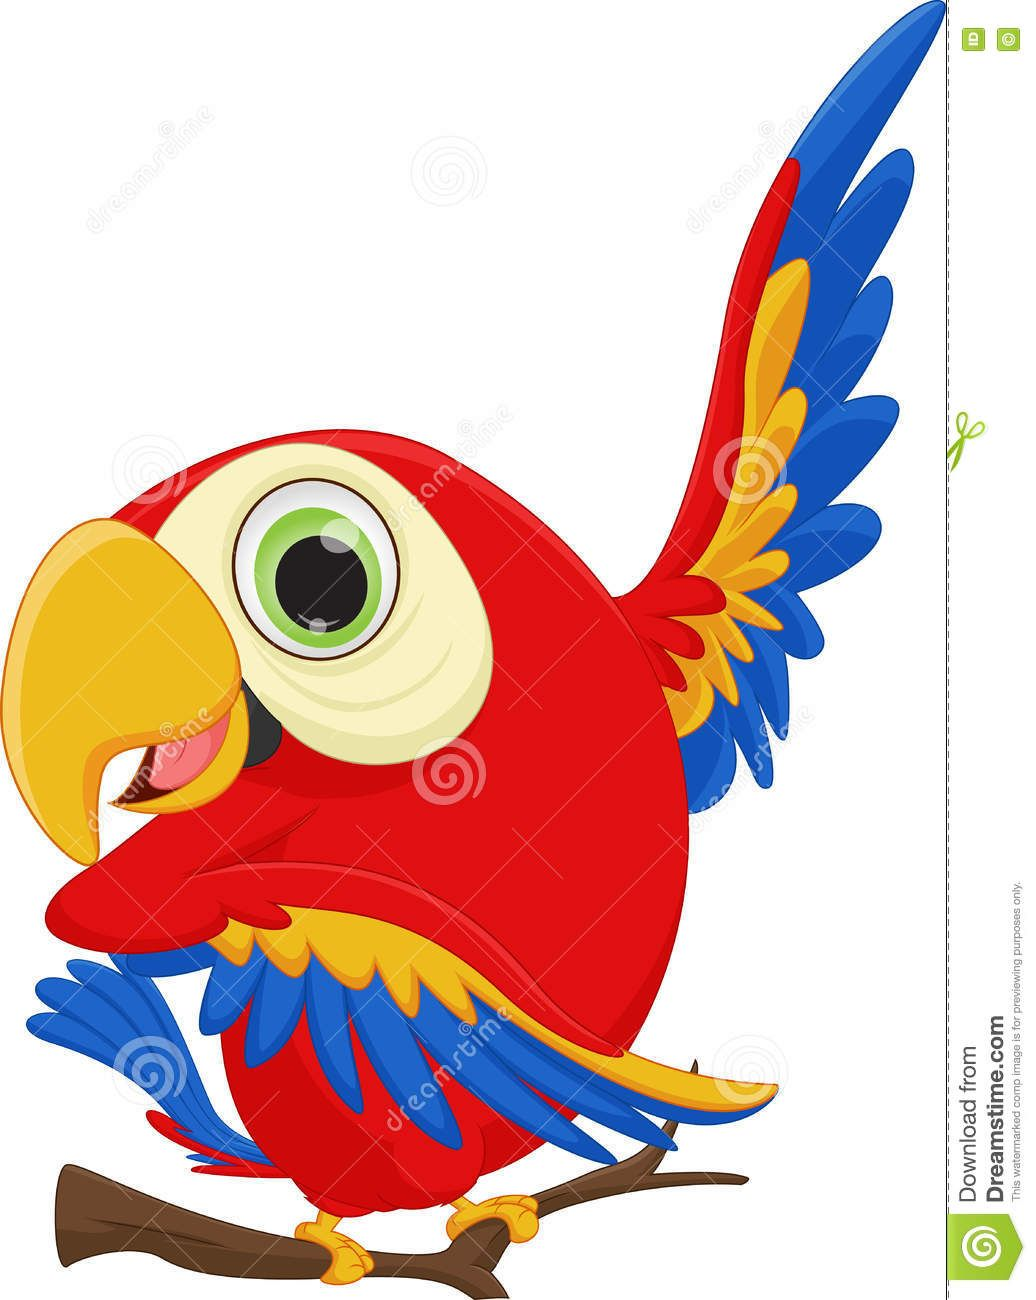 Cute Macaw Bird Cartoon Waving Stock Vector Image 73343675 Macaw Cartoon Vector Illustration